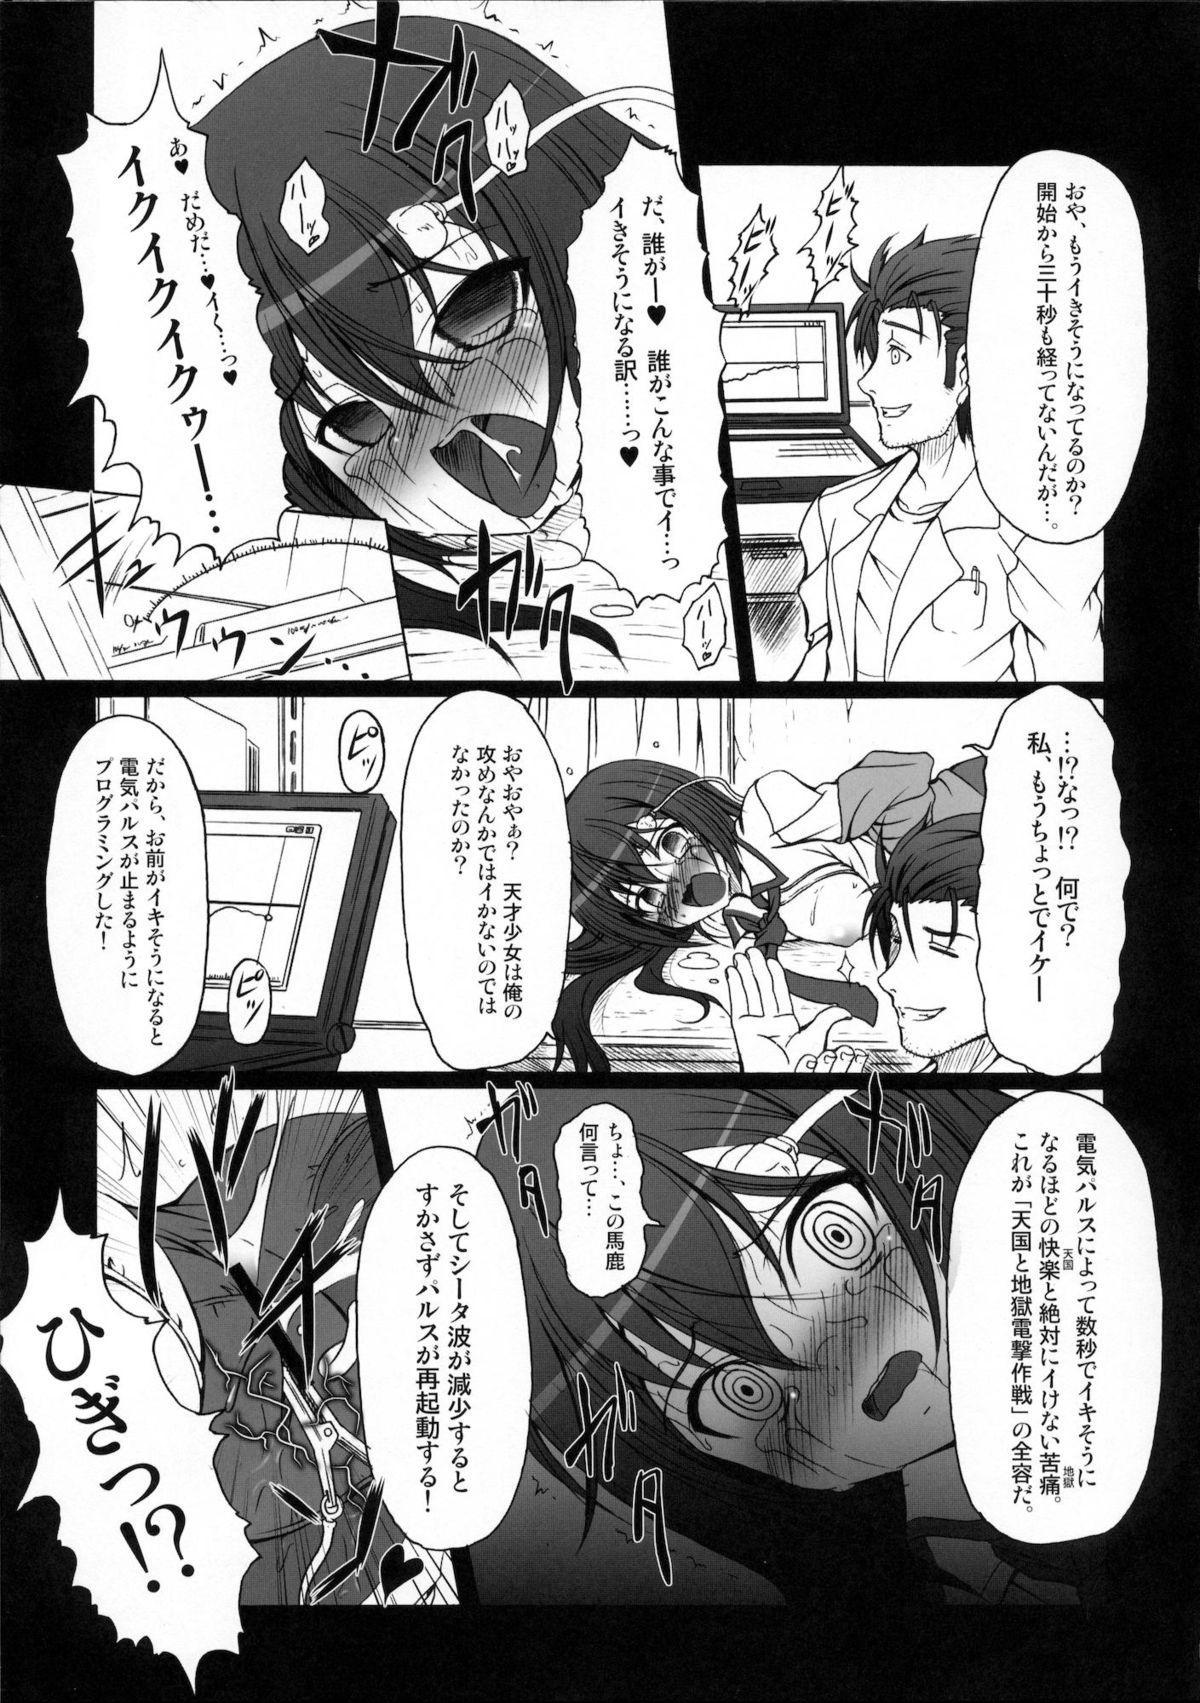 HOBBY'S BLOCK!! 14 Kairaku Tousaku no Ecstasy 13